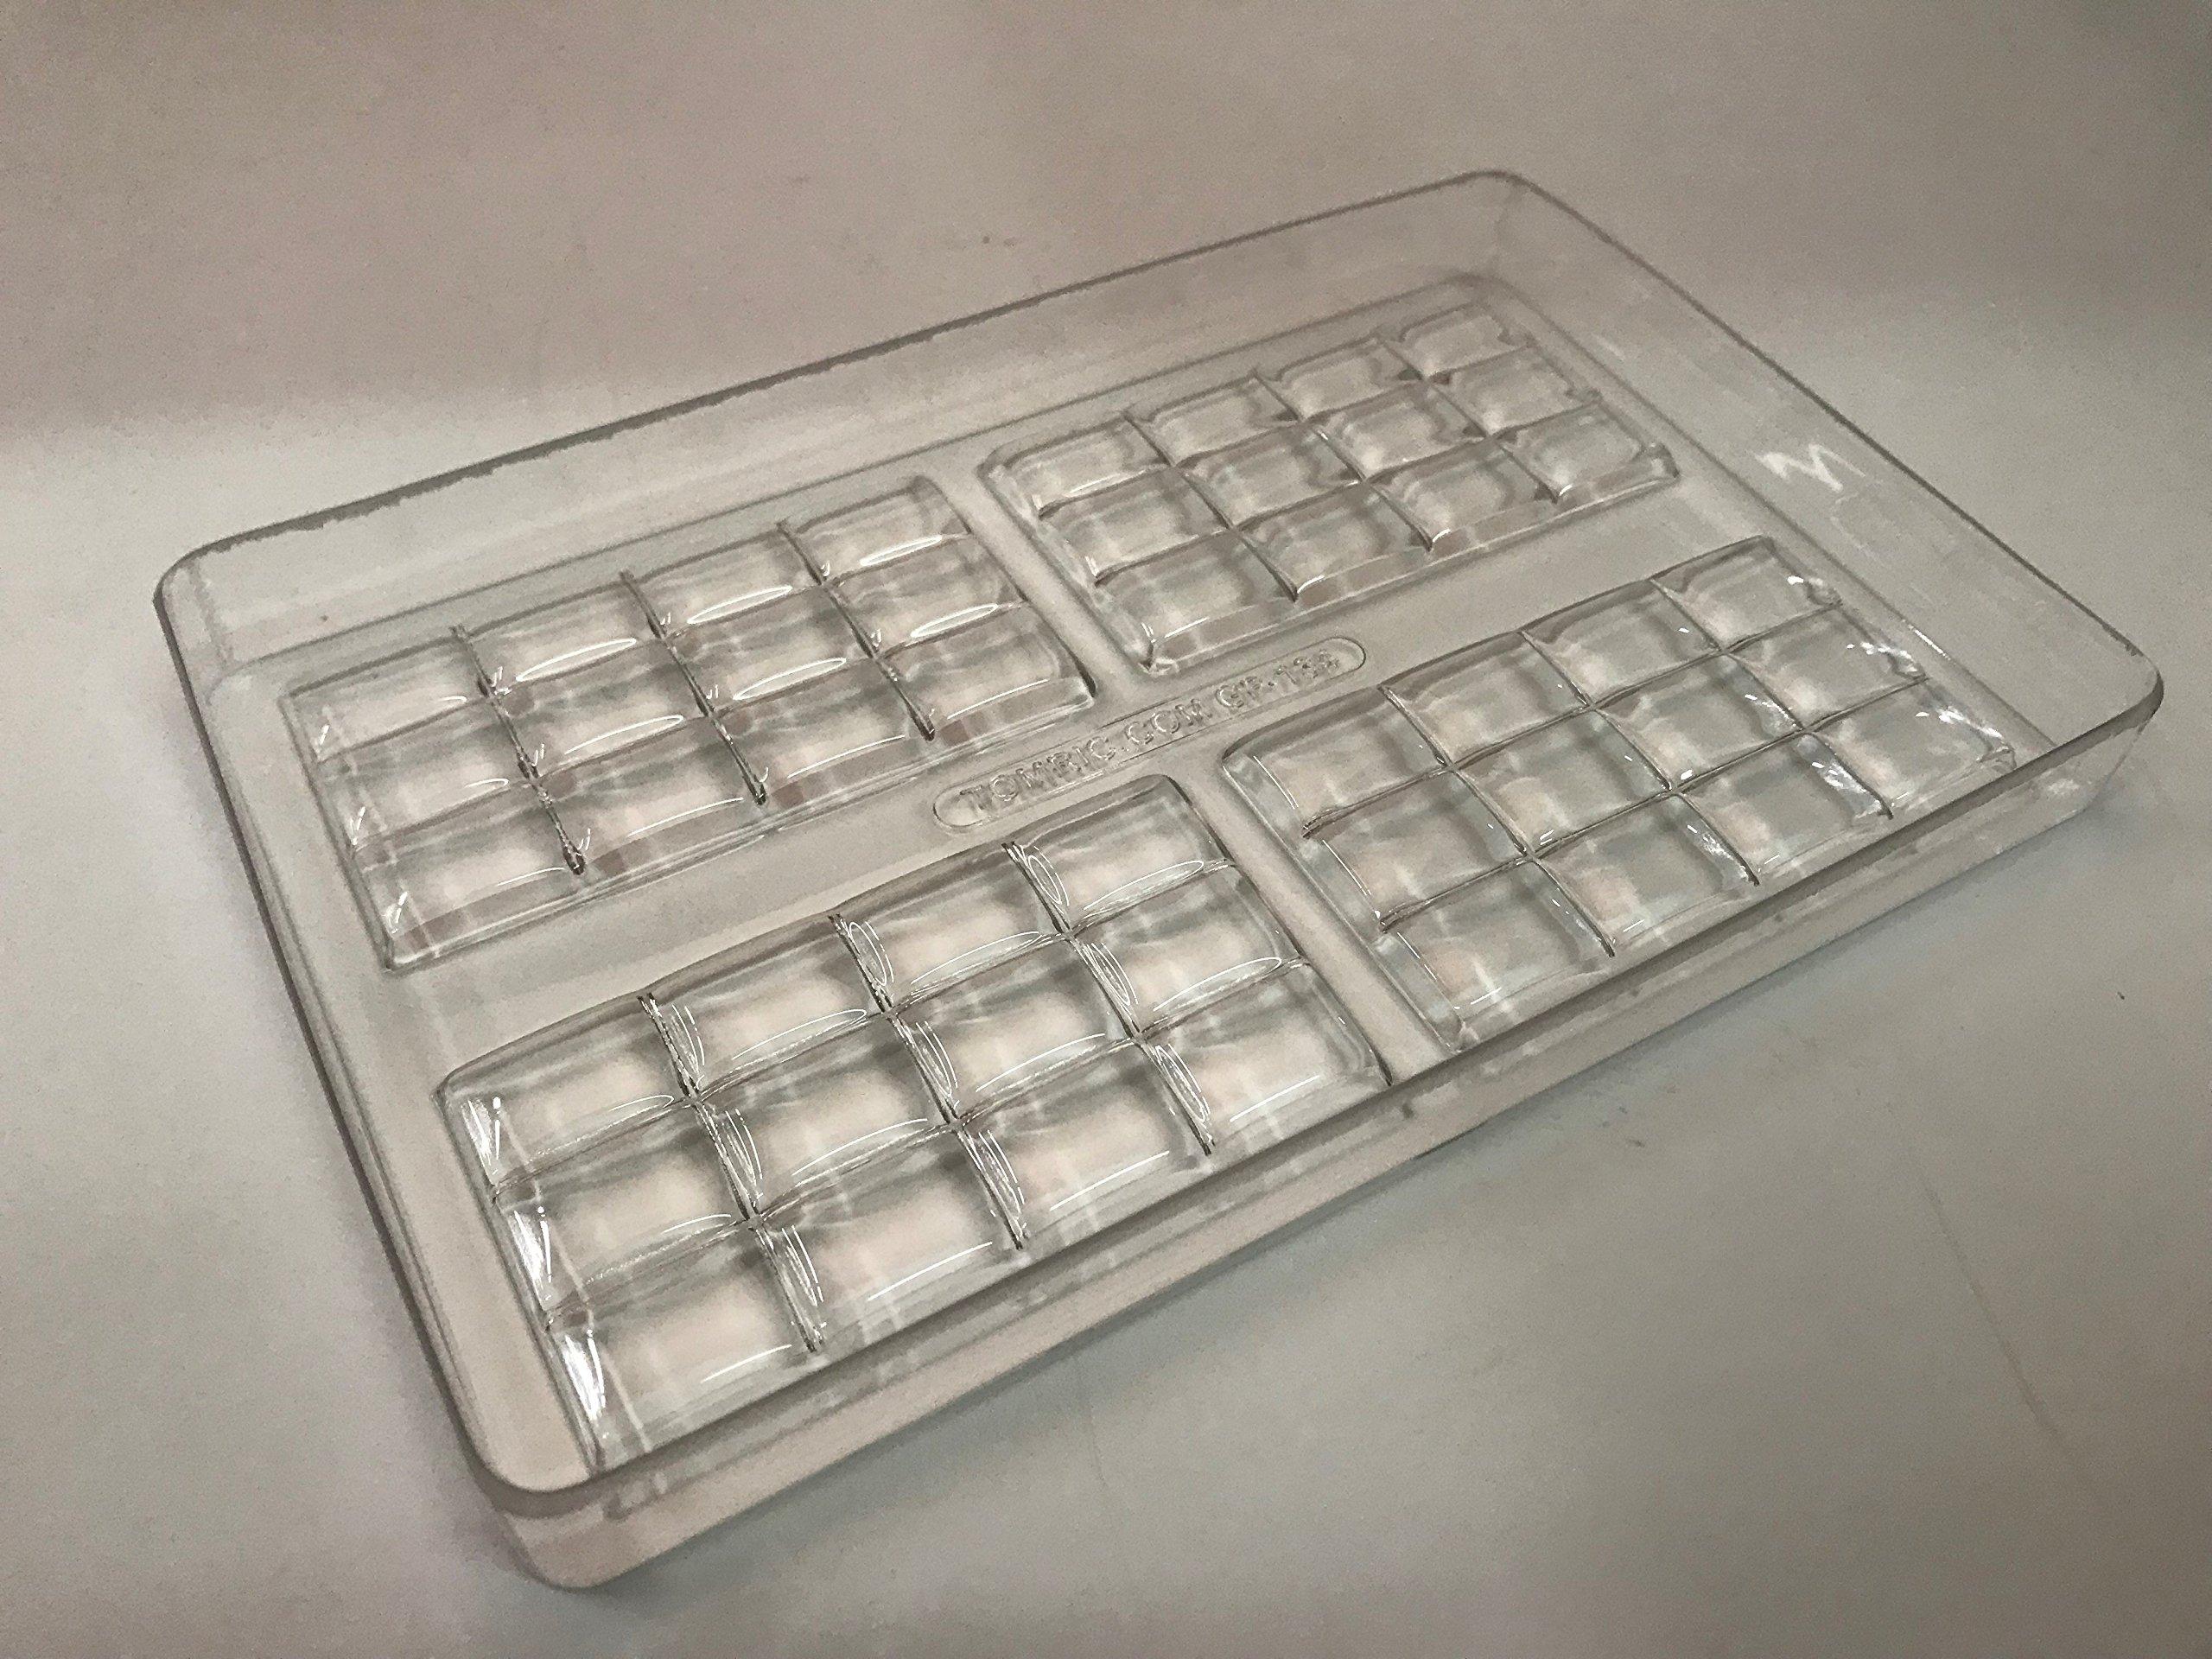 Polycarbonate Bar Mold for Chocolate (Pillow Top Bar Design)